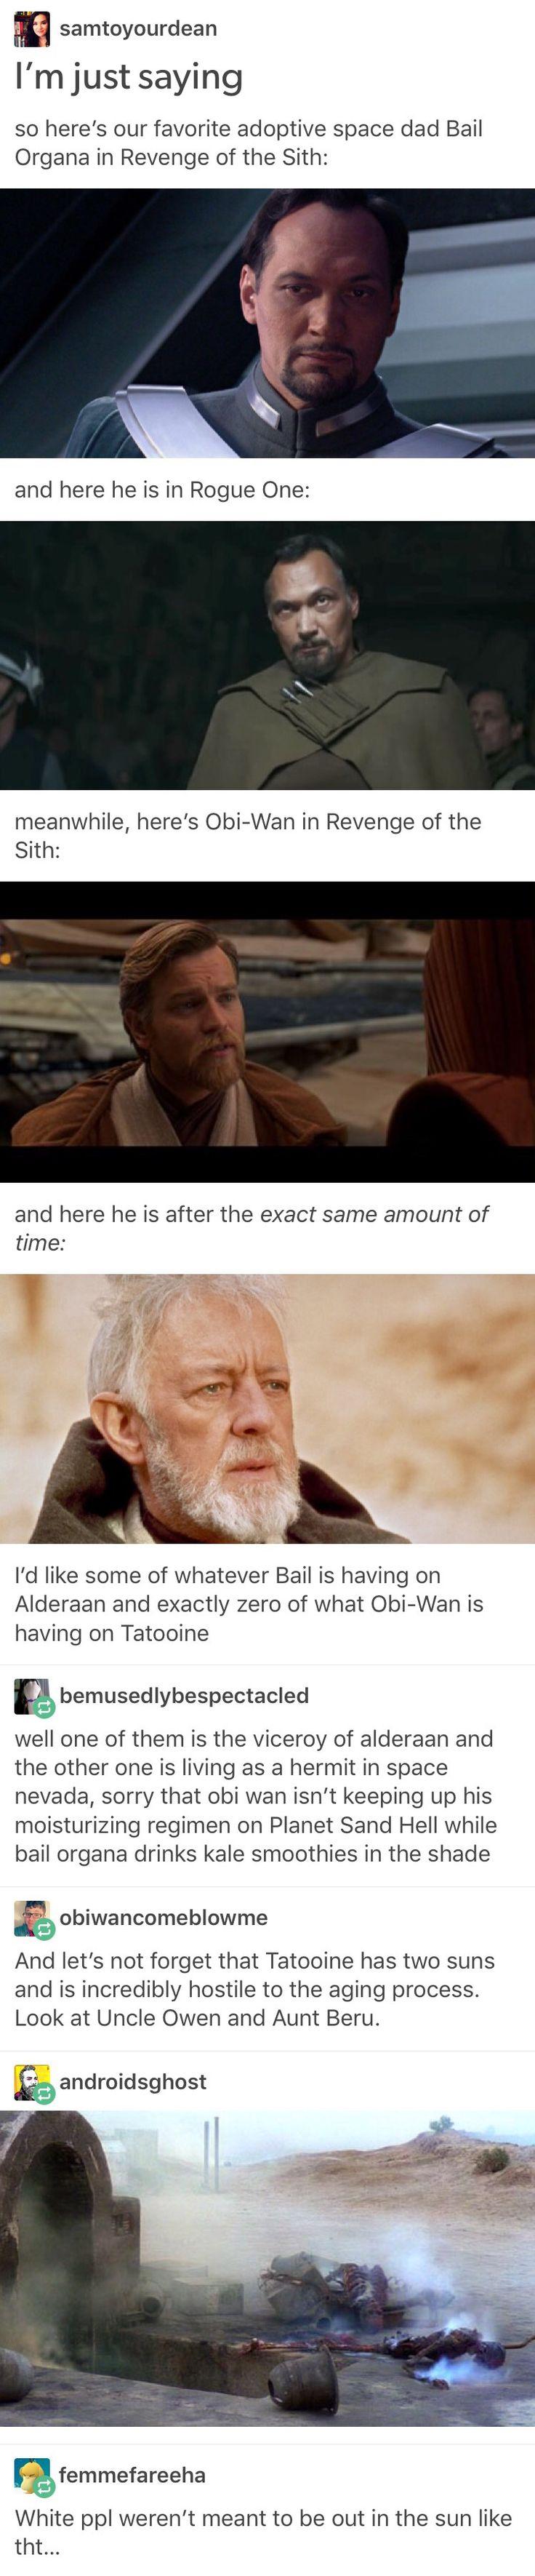 White people aren't meant for the sun // Star Wars, Obi Wan Kenobi, Bail Organa